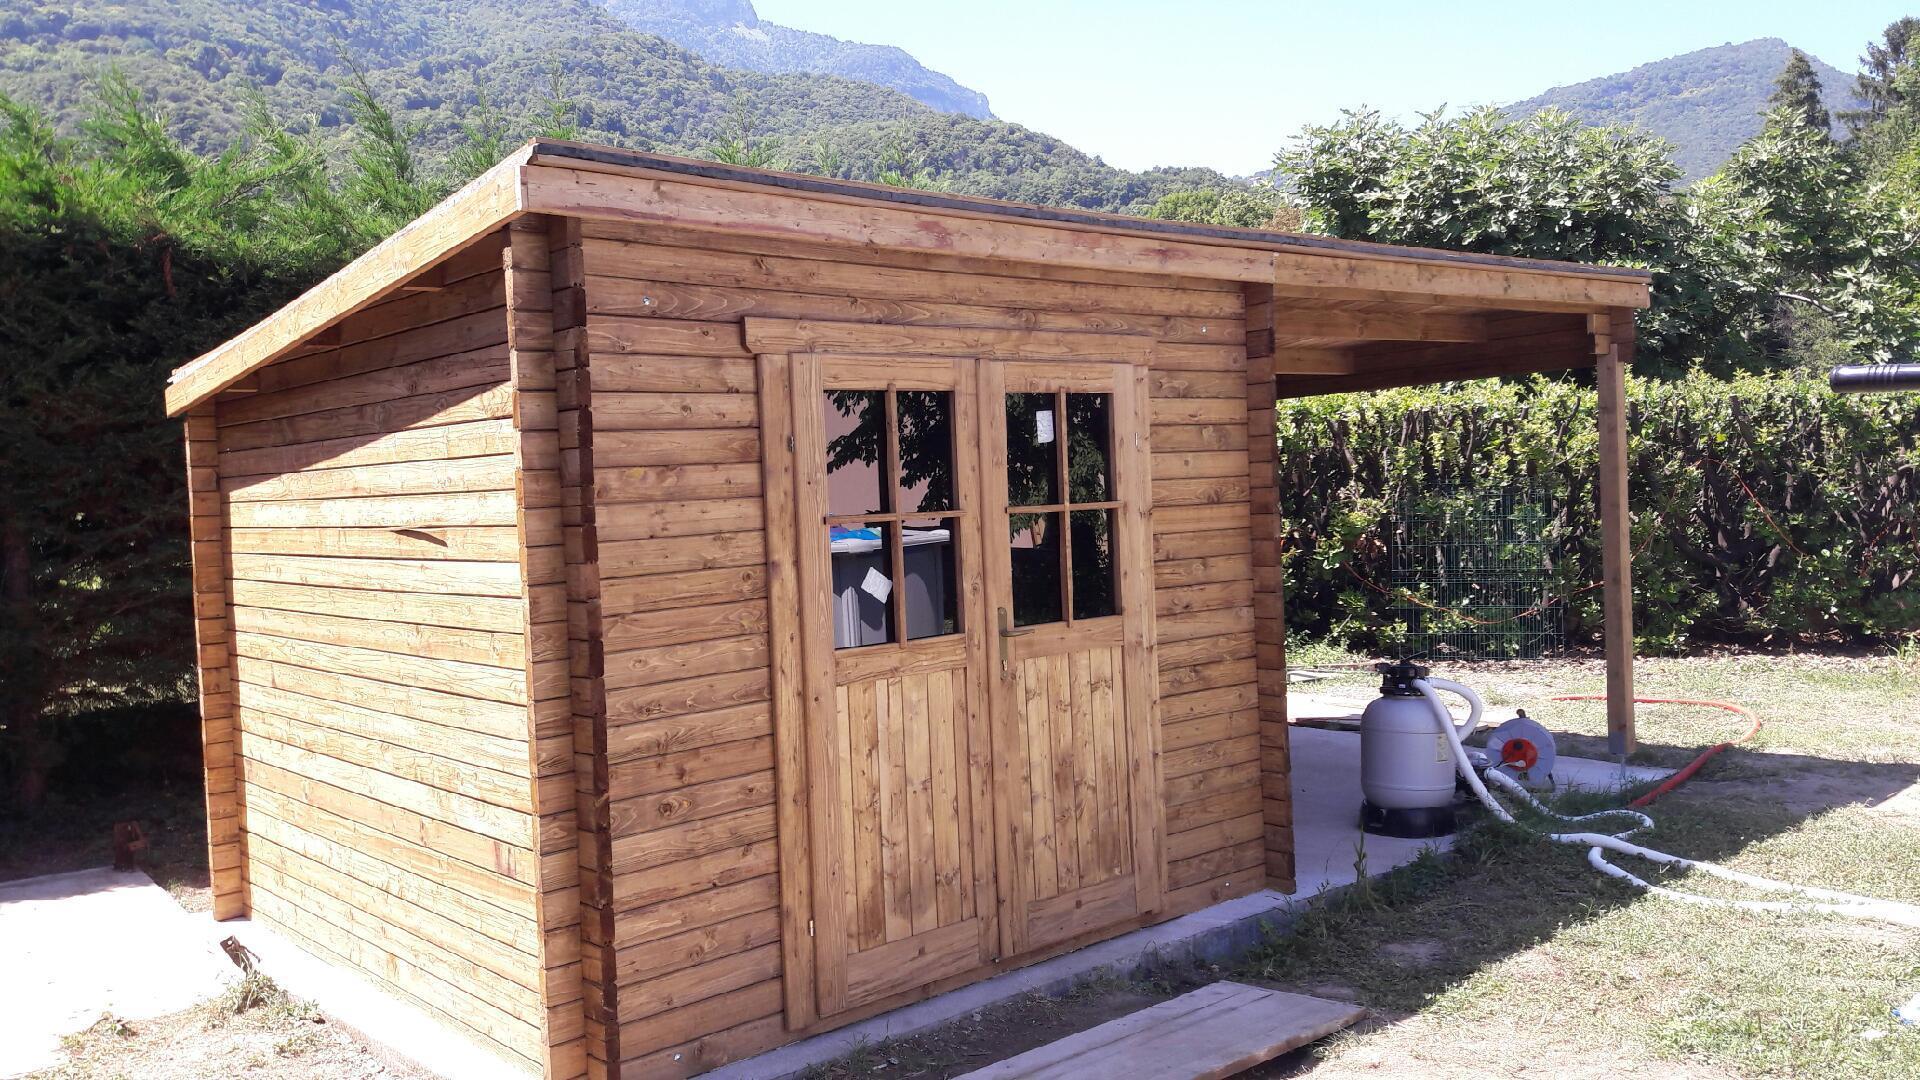 Abri toit plat bois traité 9m² 40mm + Terrasse 9m² Gardy Shelter